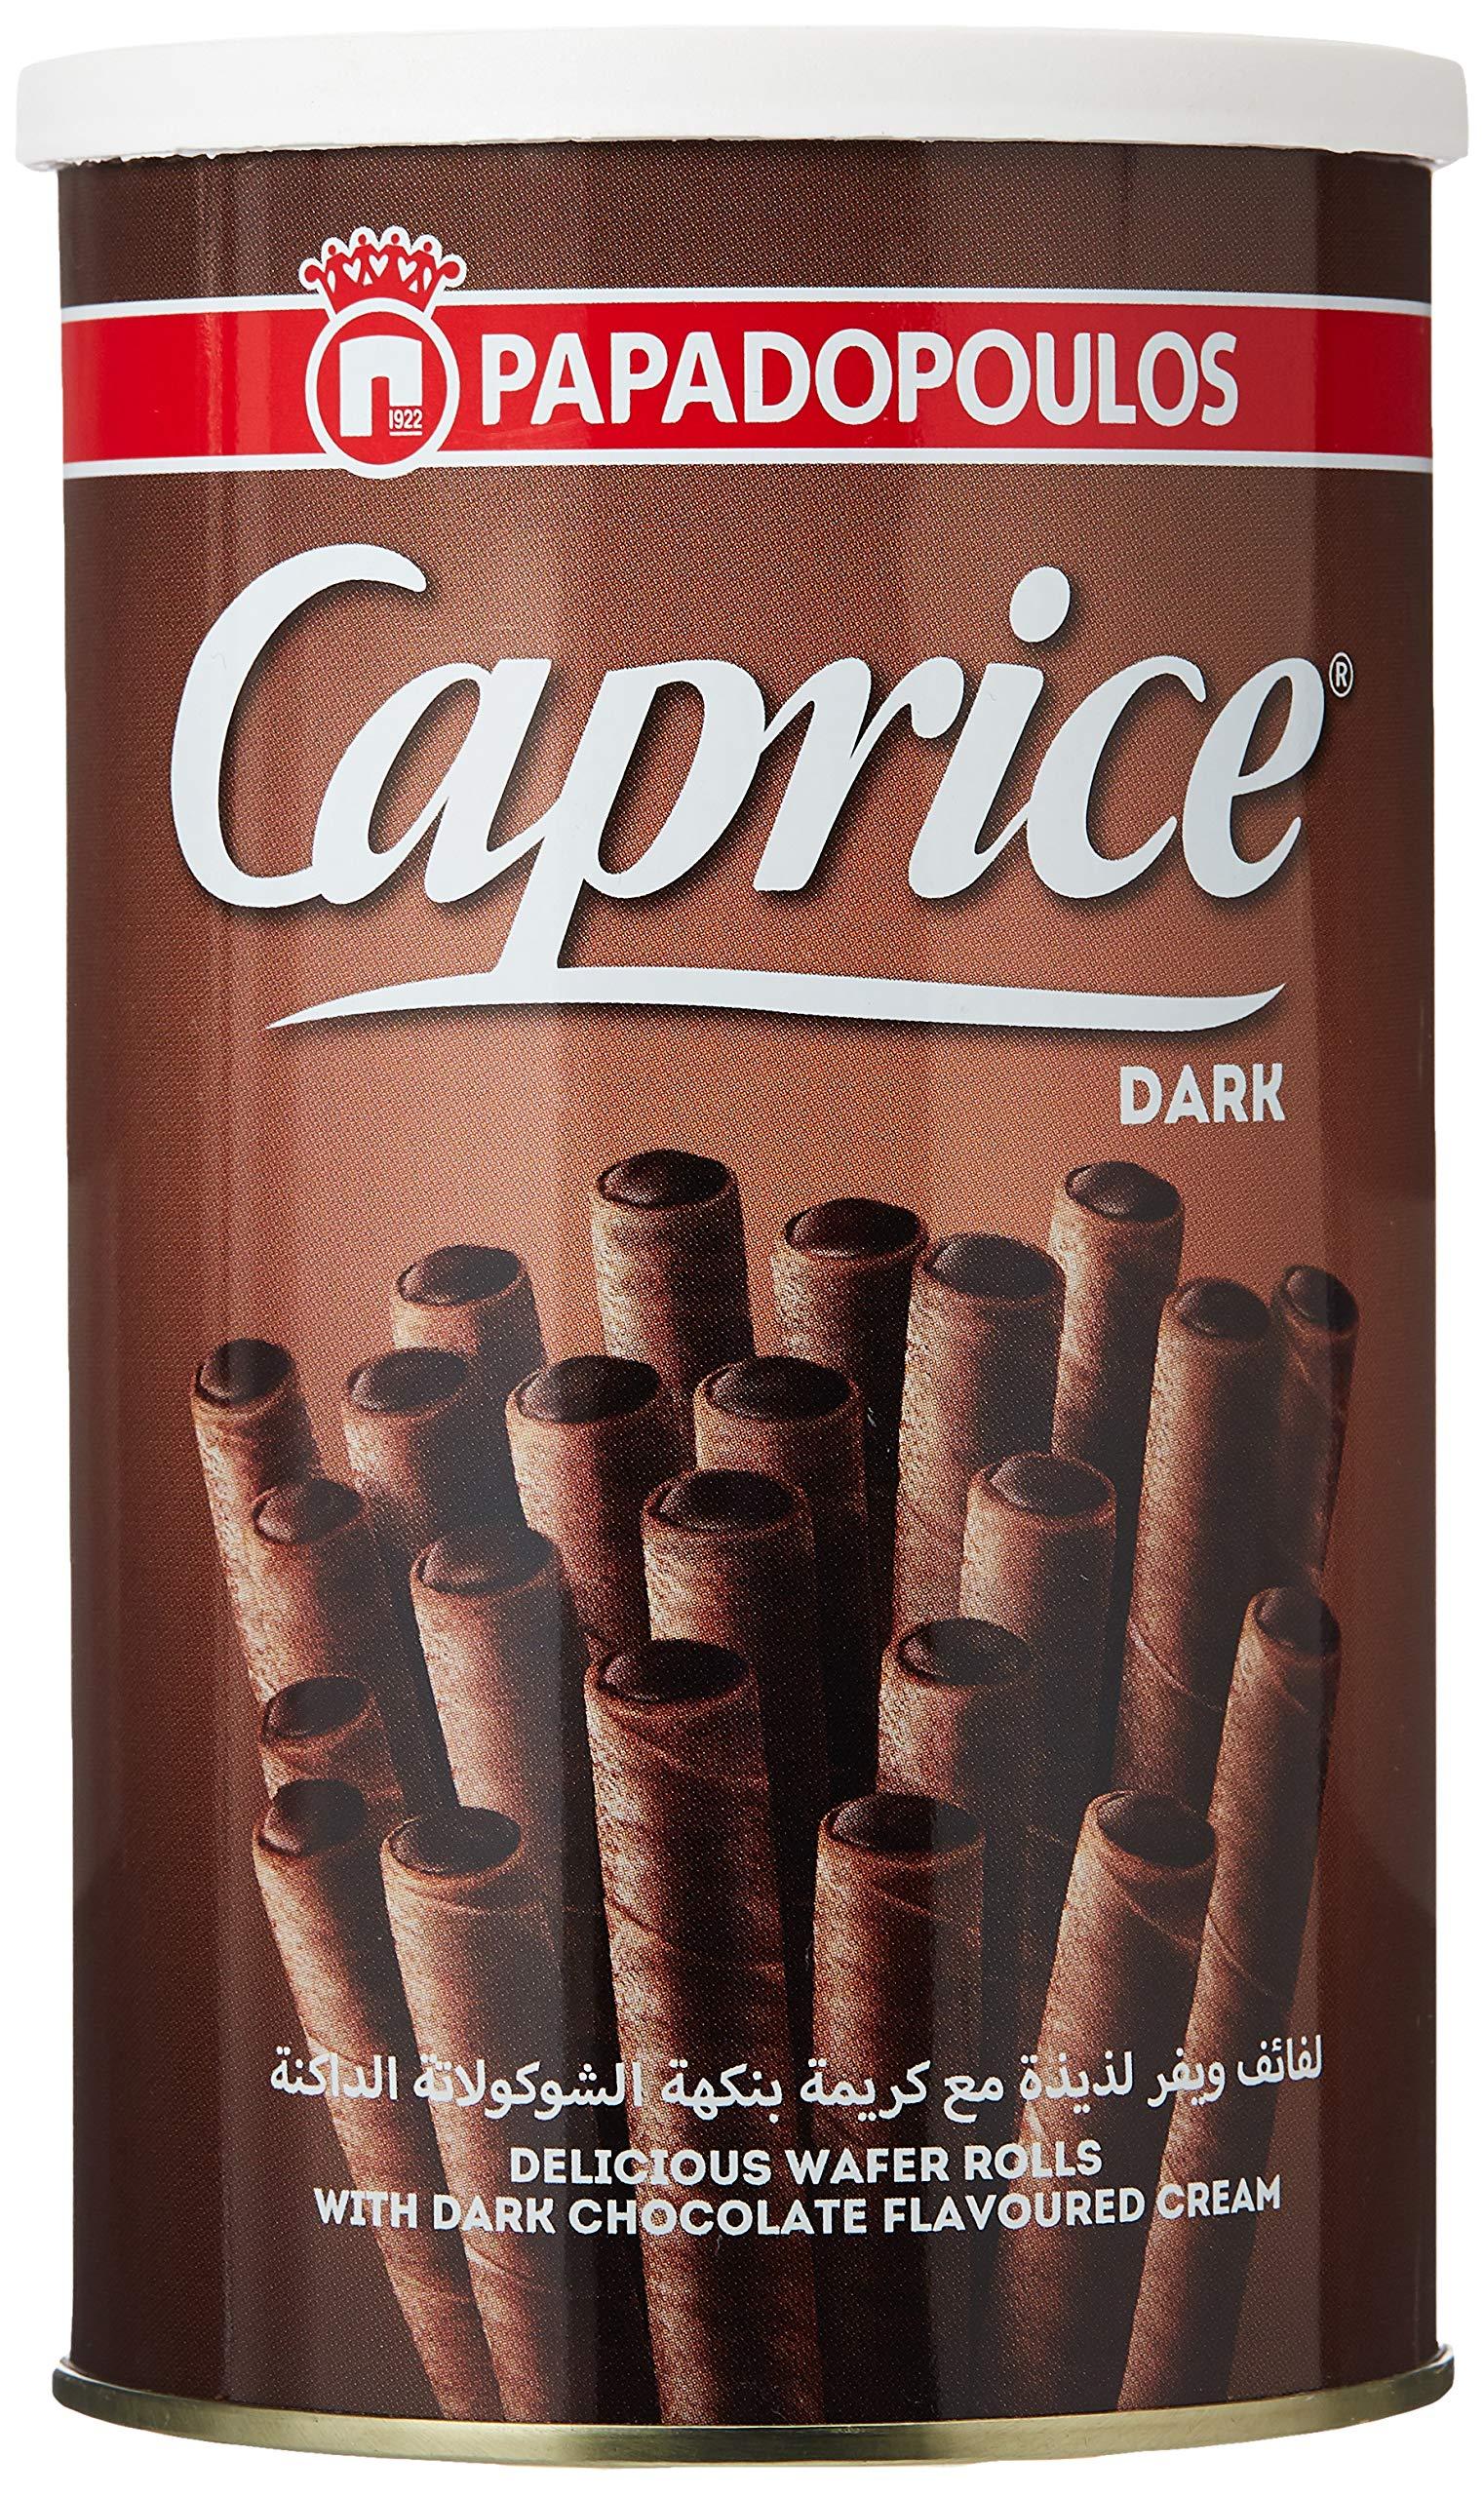 Caprice - Dark Chocolate Filled Wafers, 250g